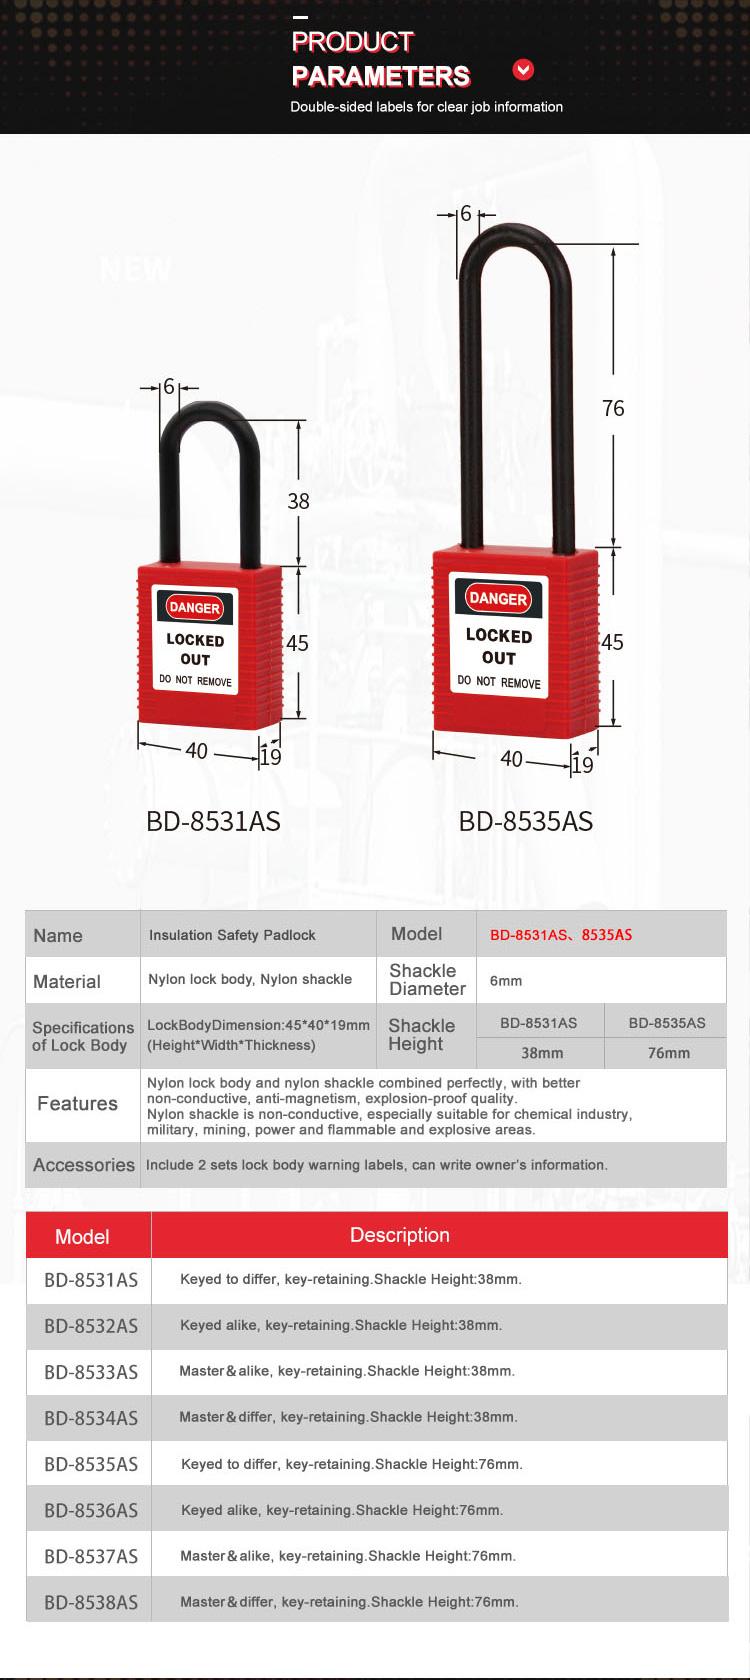 BD-8531AS-35AS